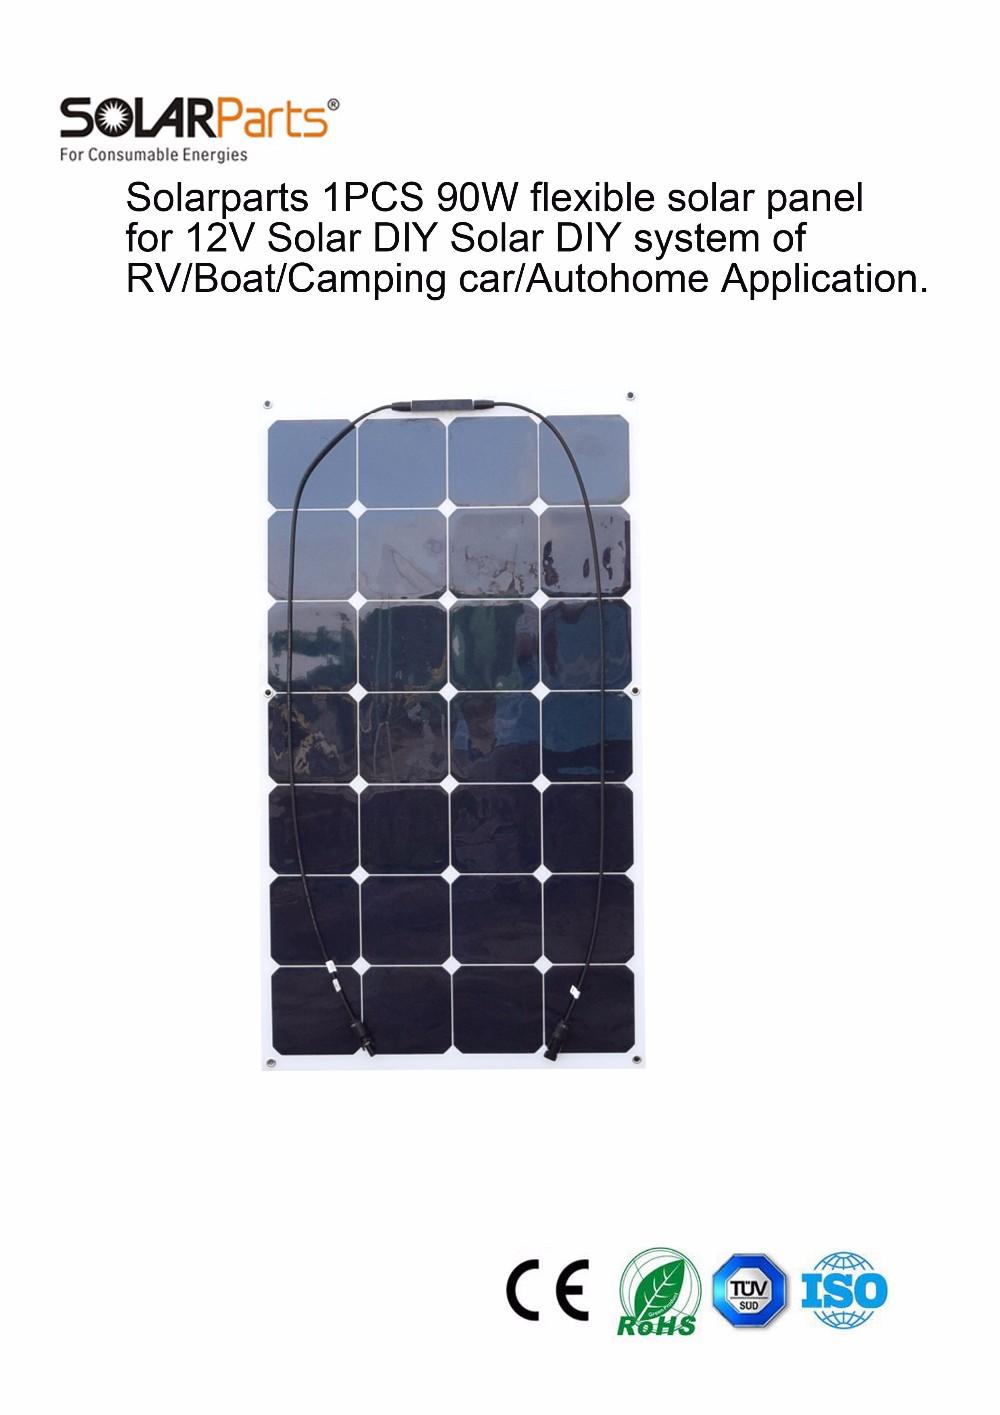 Solarparts 1x 90W flexible solar panel 12V solar system